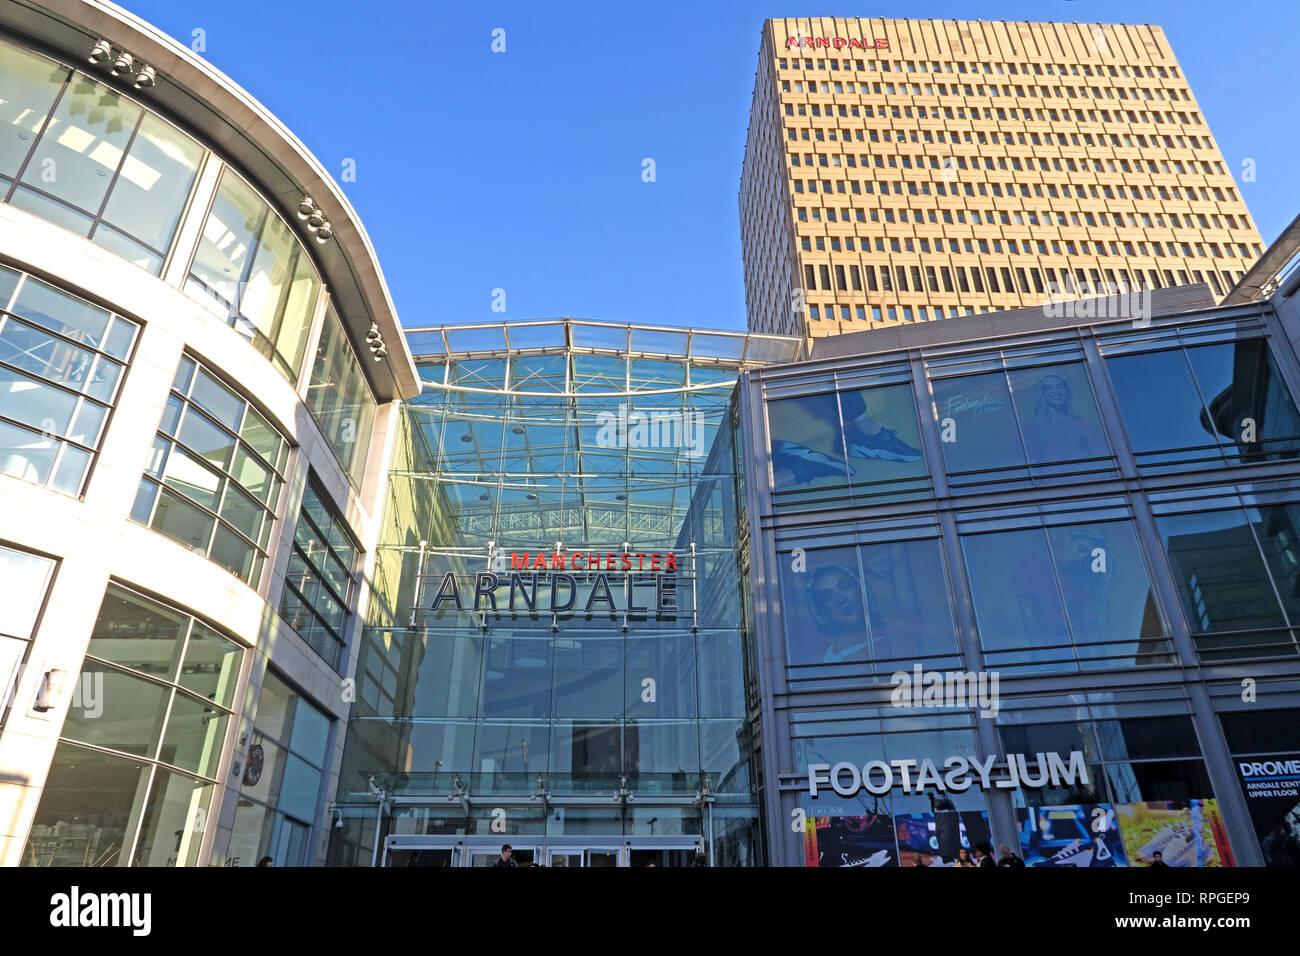 GoTonySmith,HotpixUK,@HotpixUK,Manchester,England,UK,GB,North West England,stores,Glass,1970s,Sun,sunny day